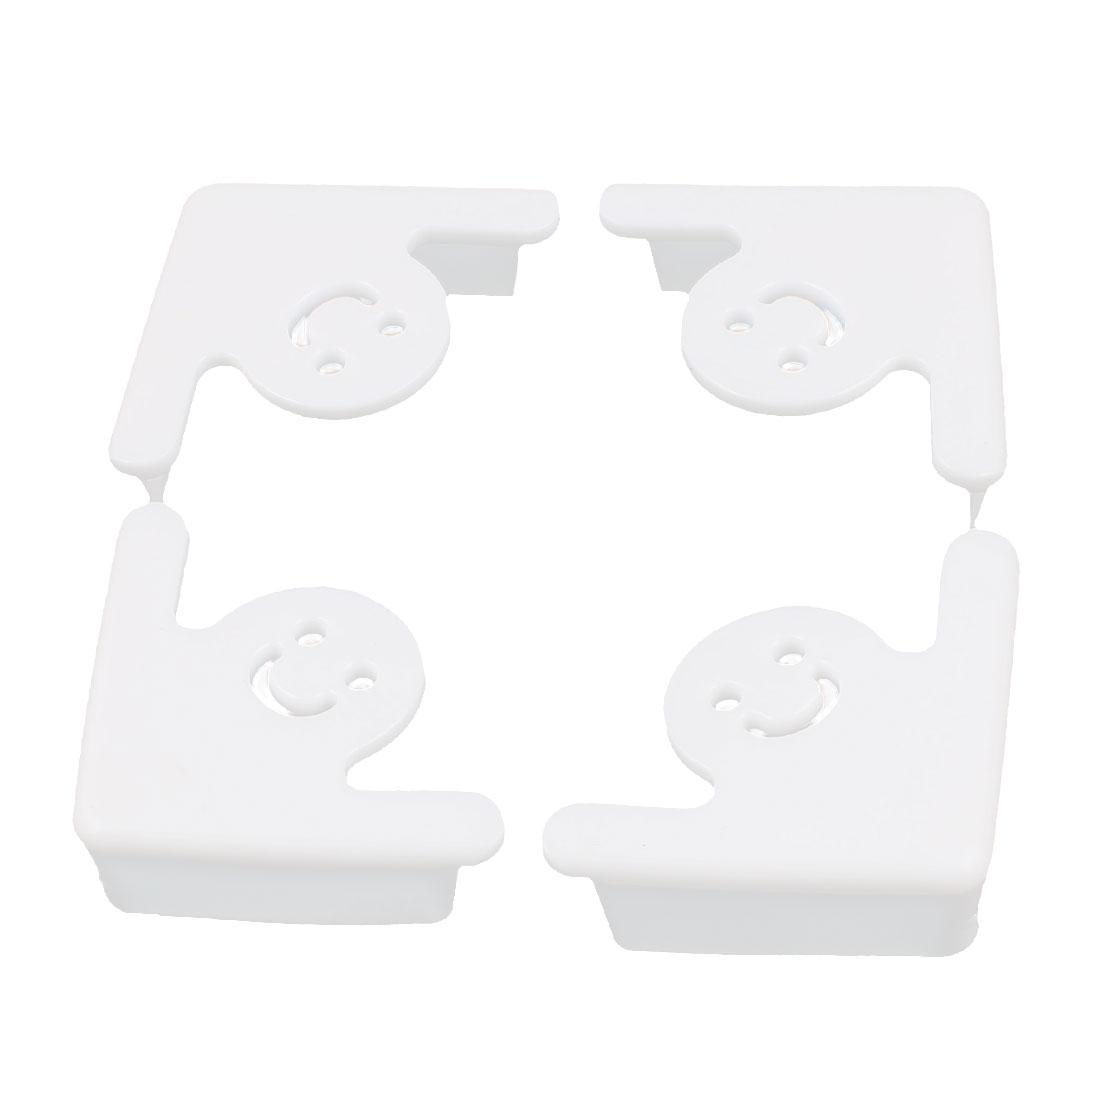 4 Pcs Proof Table Corner Desk Edge Soft Pad Cover Protector Cushion White